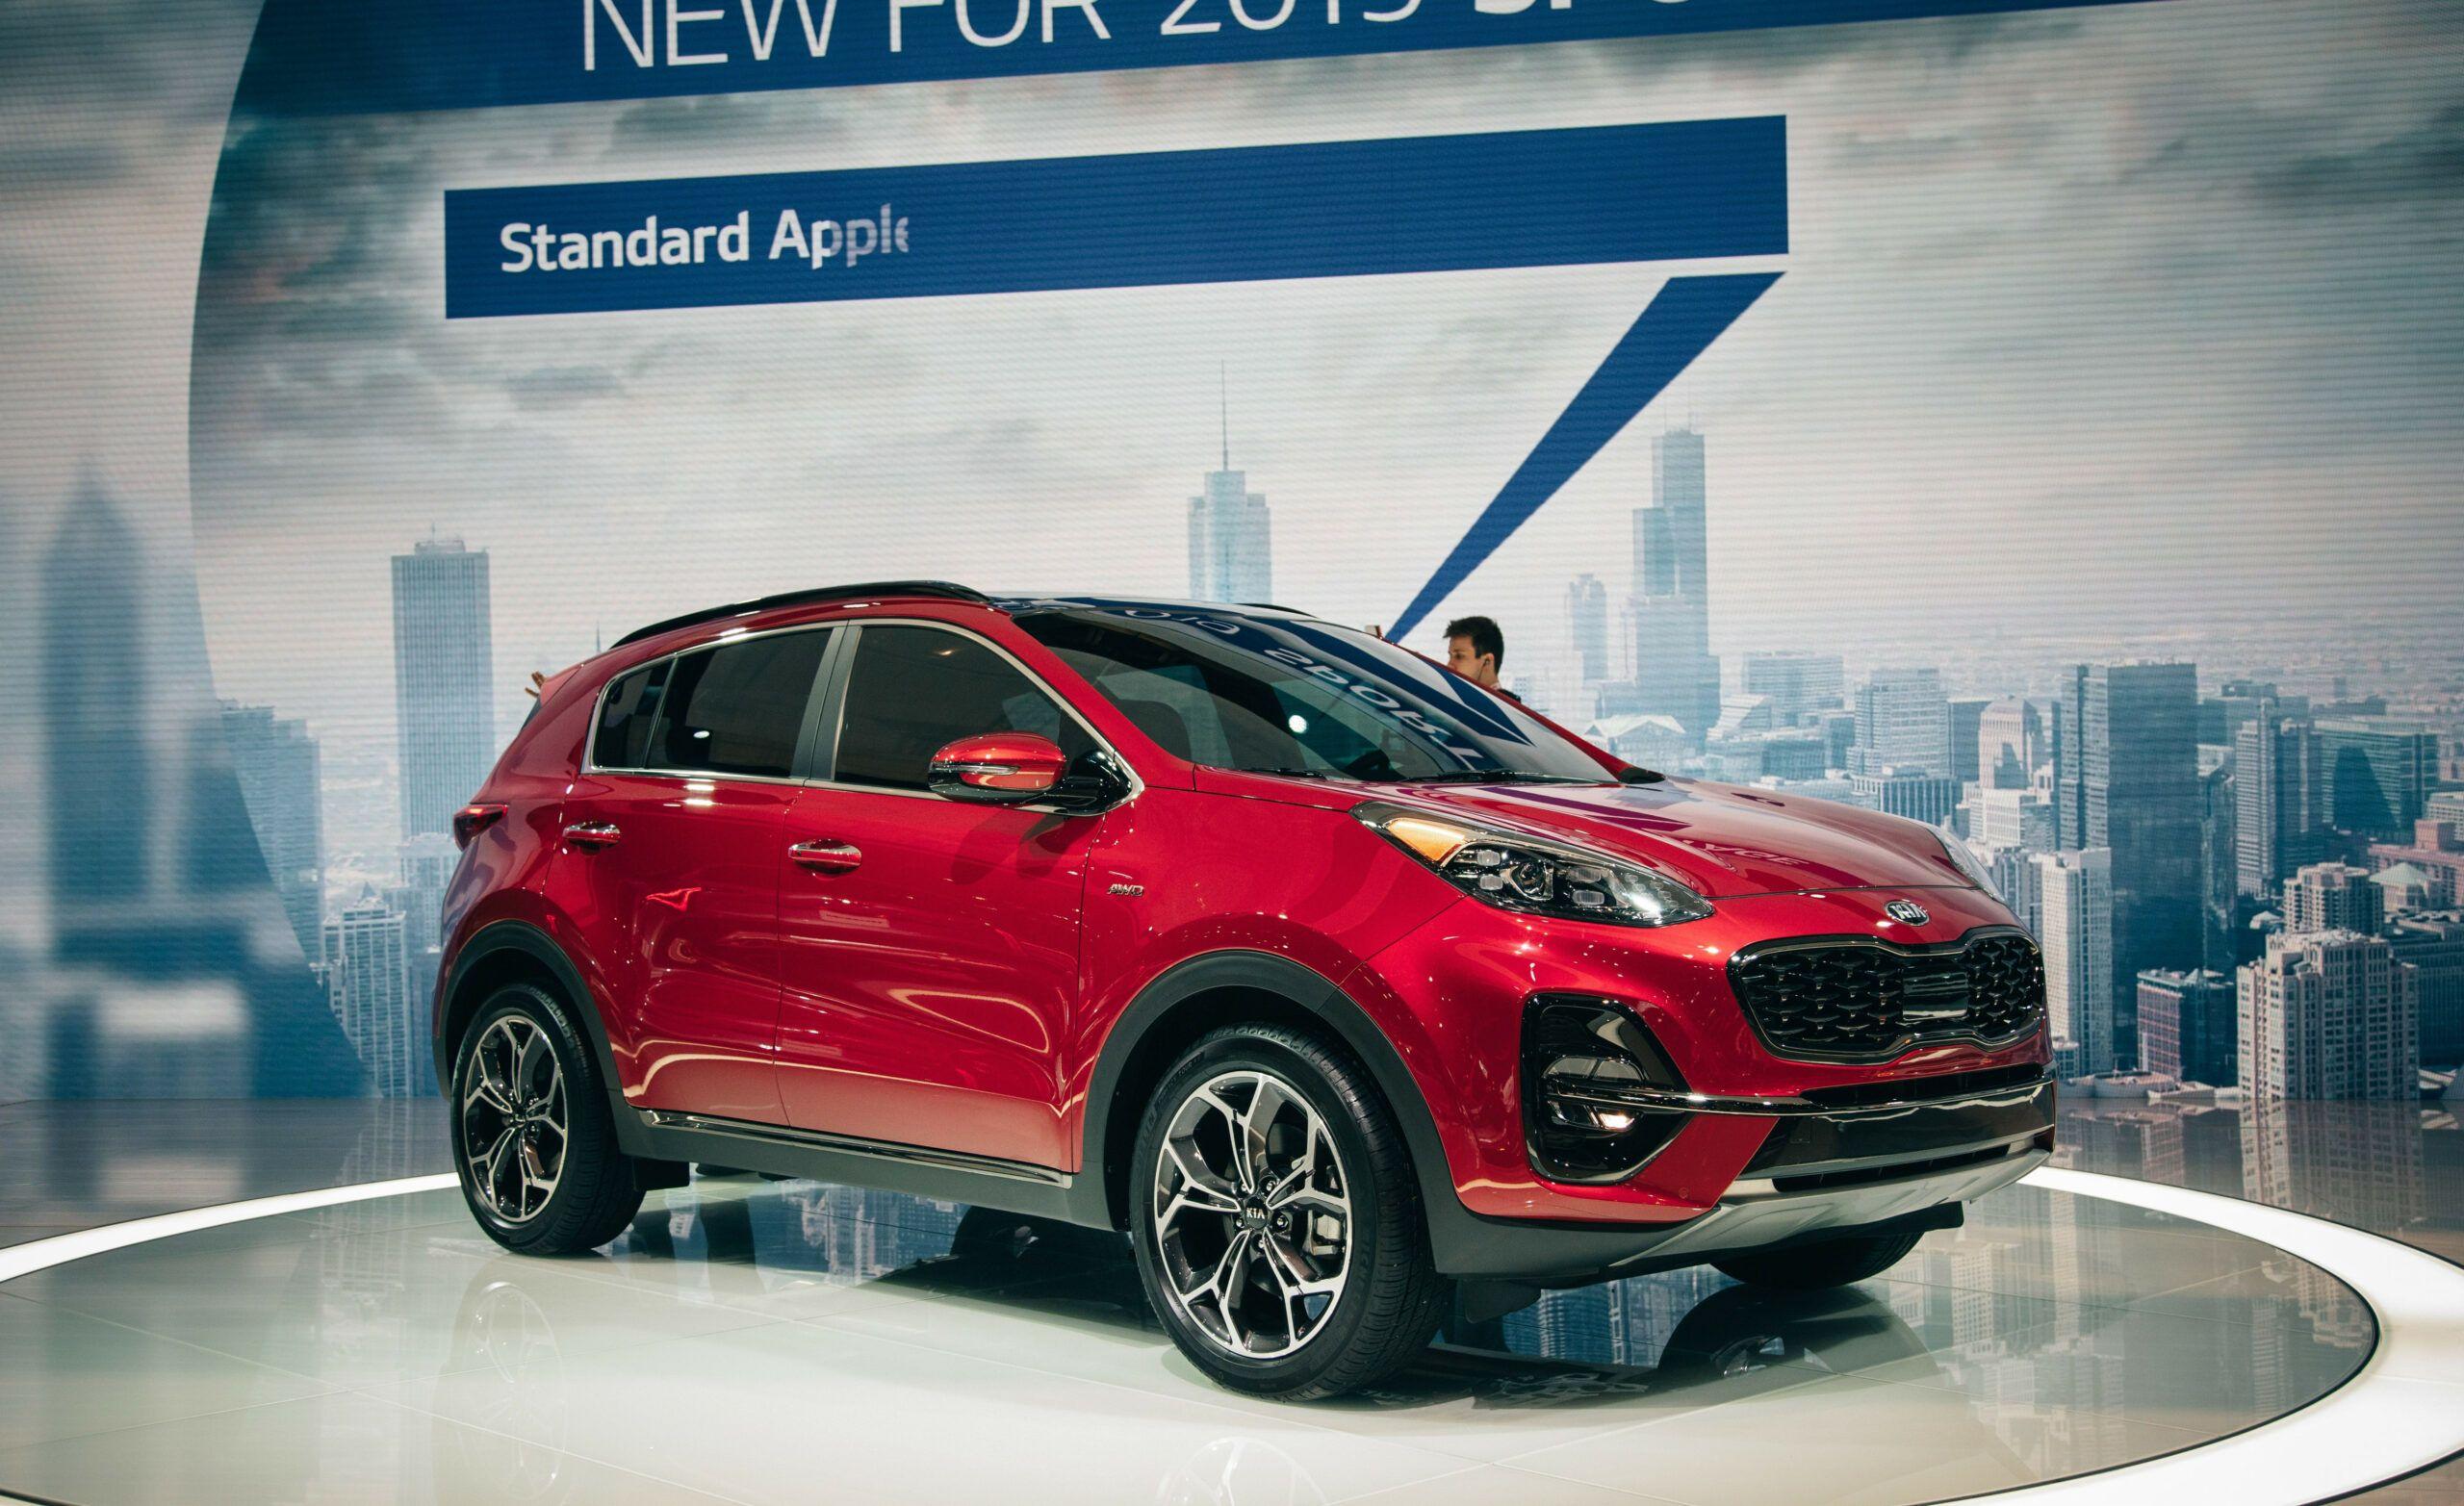 Kia Sportage 2020 Model Redesign Growing address for